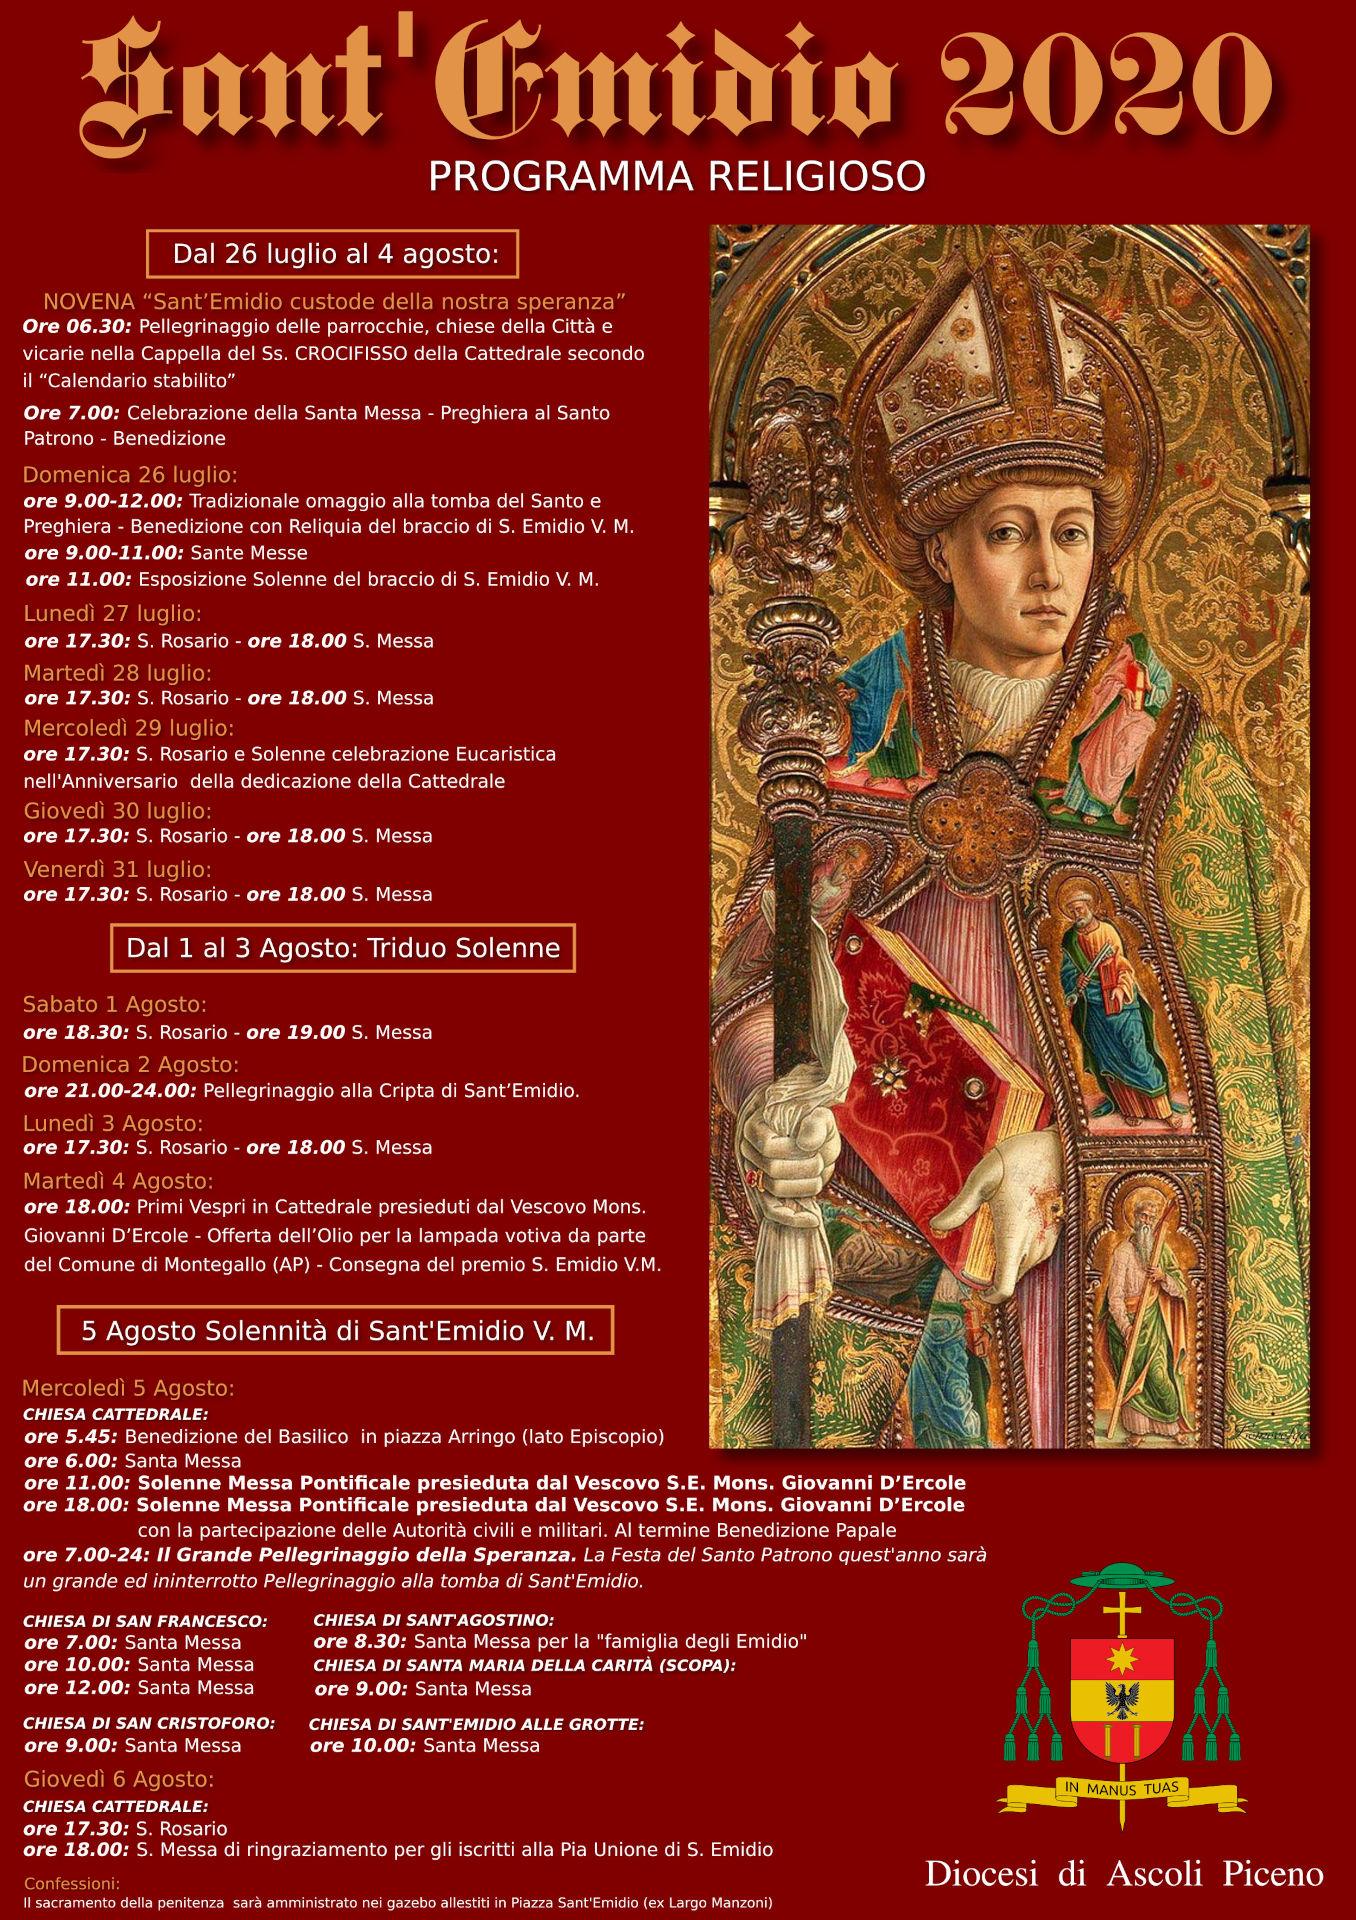 Sant'Emidio 2020 programma religioso